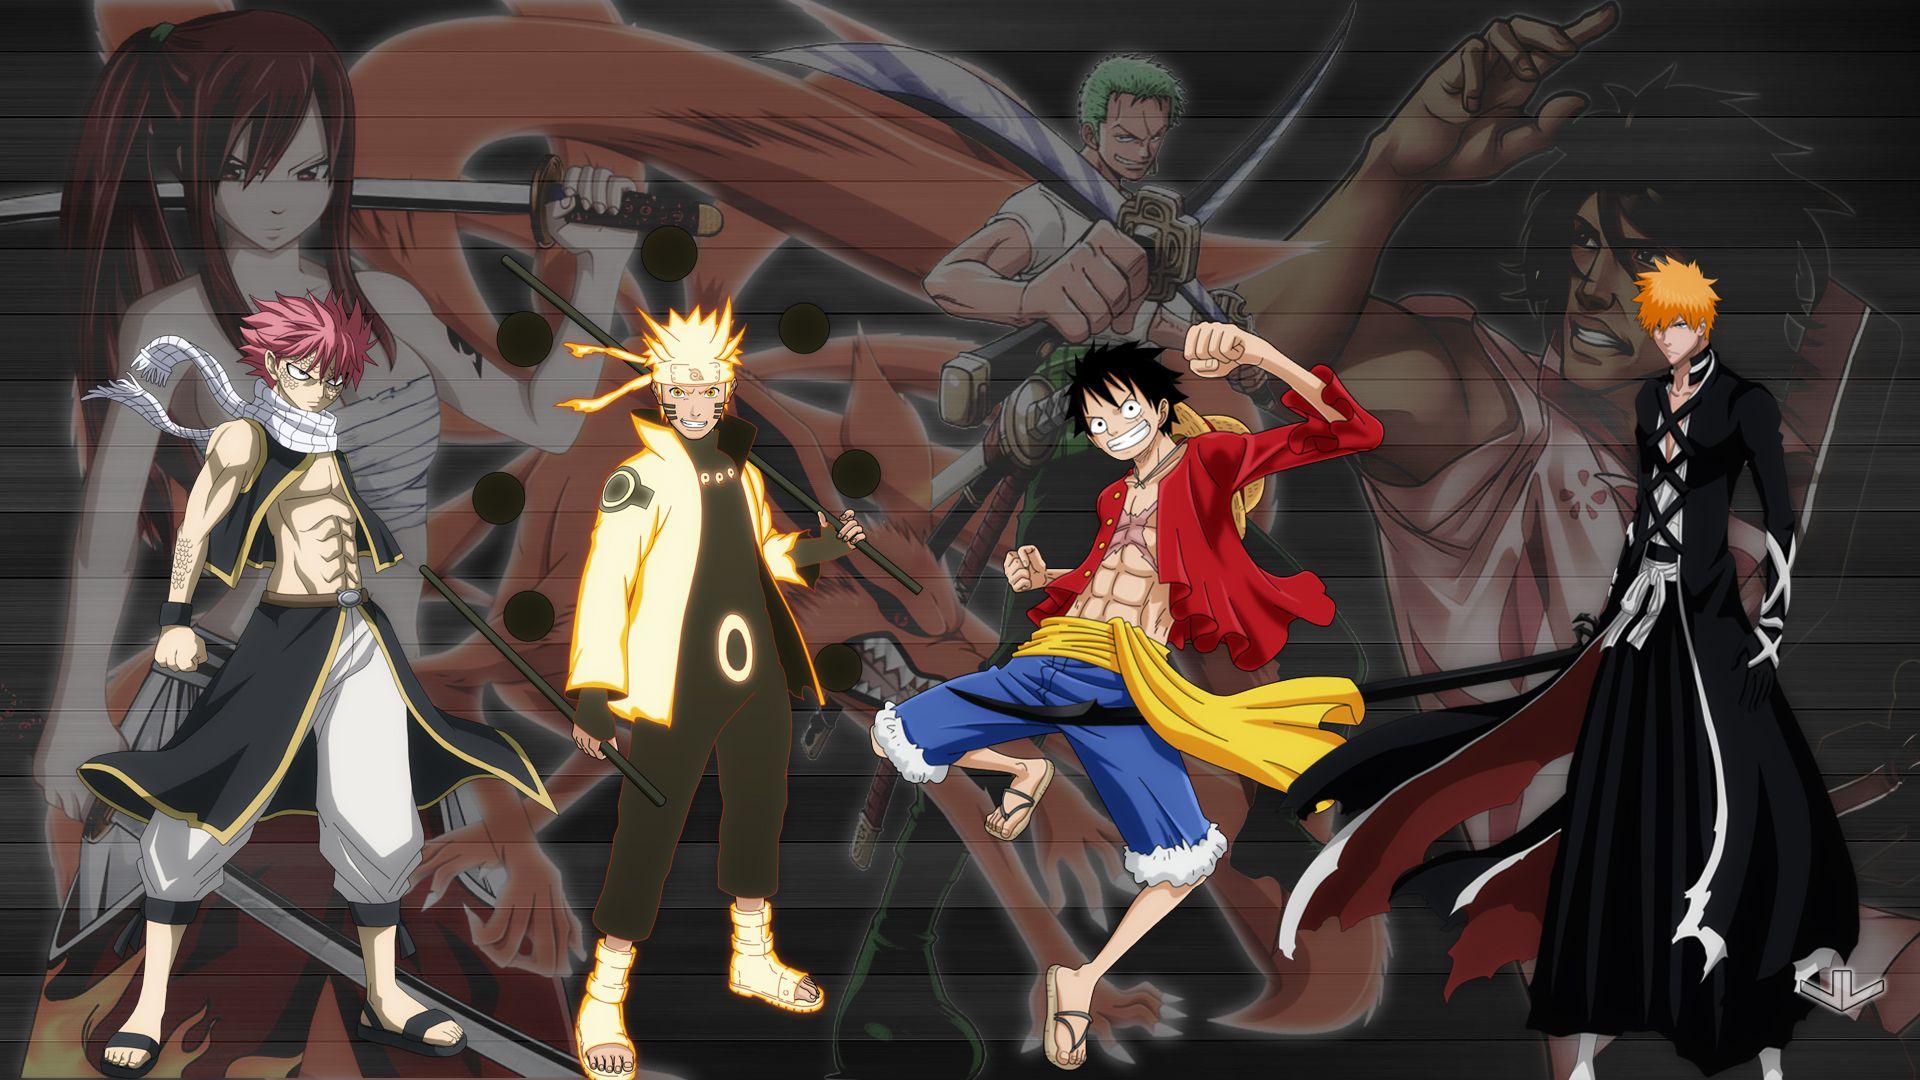 Anime Crossover Ichigo Kurosaki Natsu Dragneel Bleach One Piece